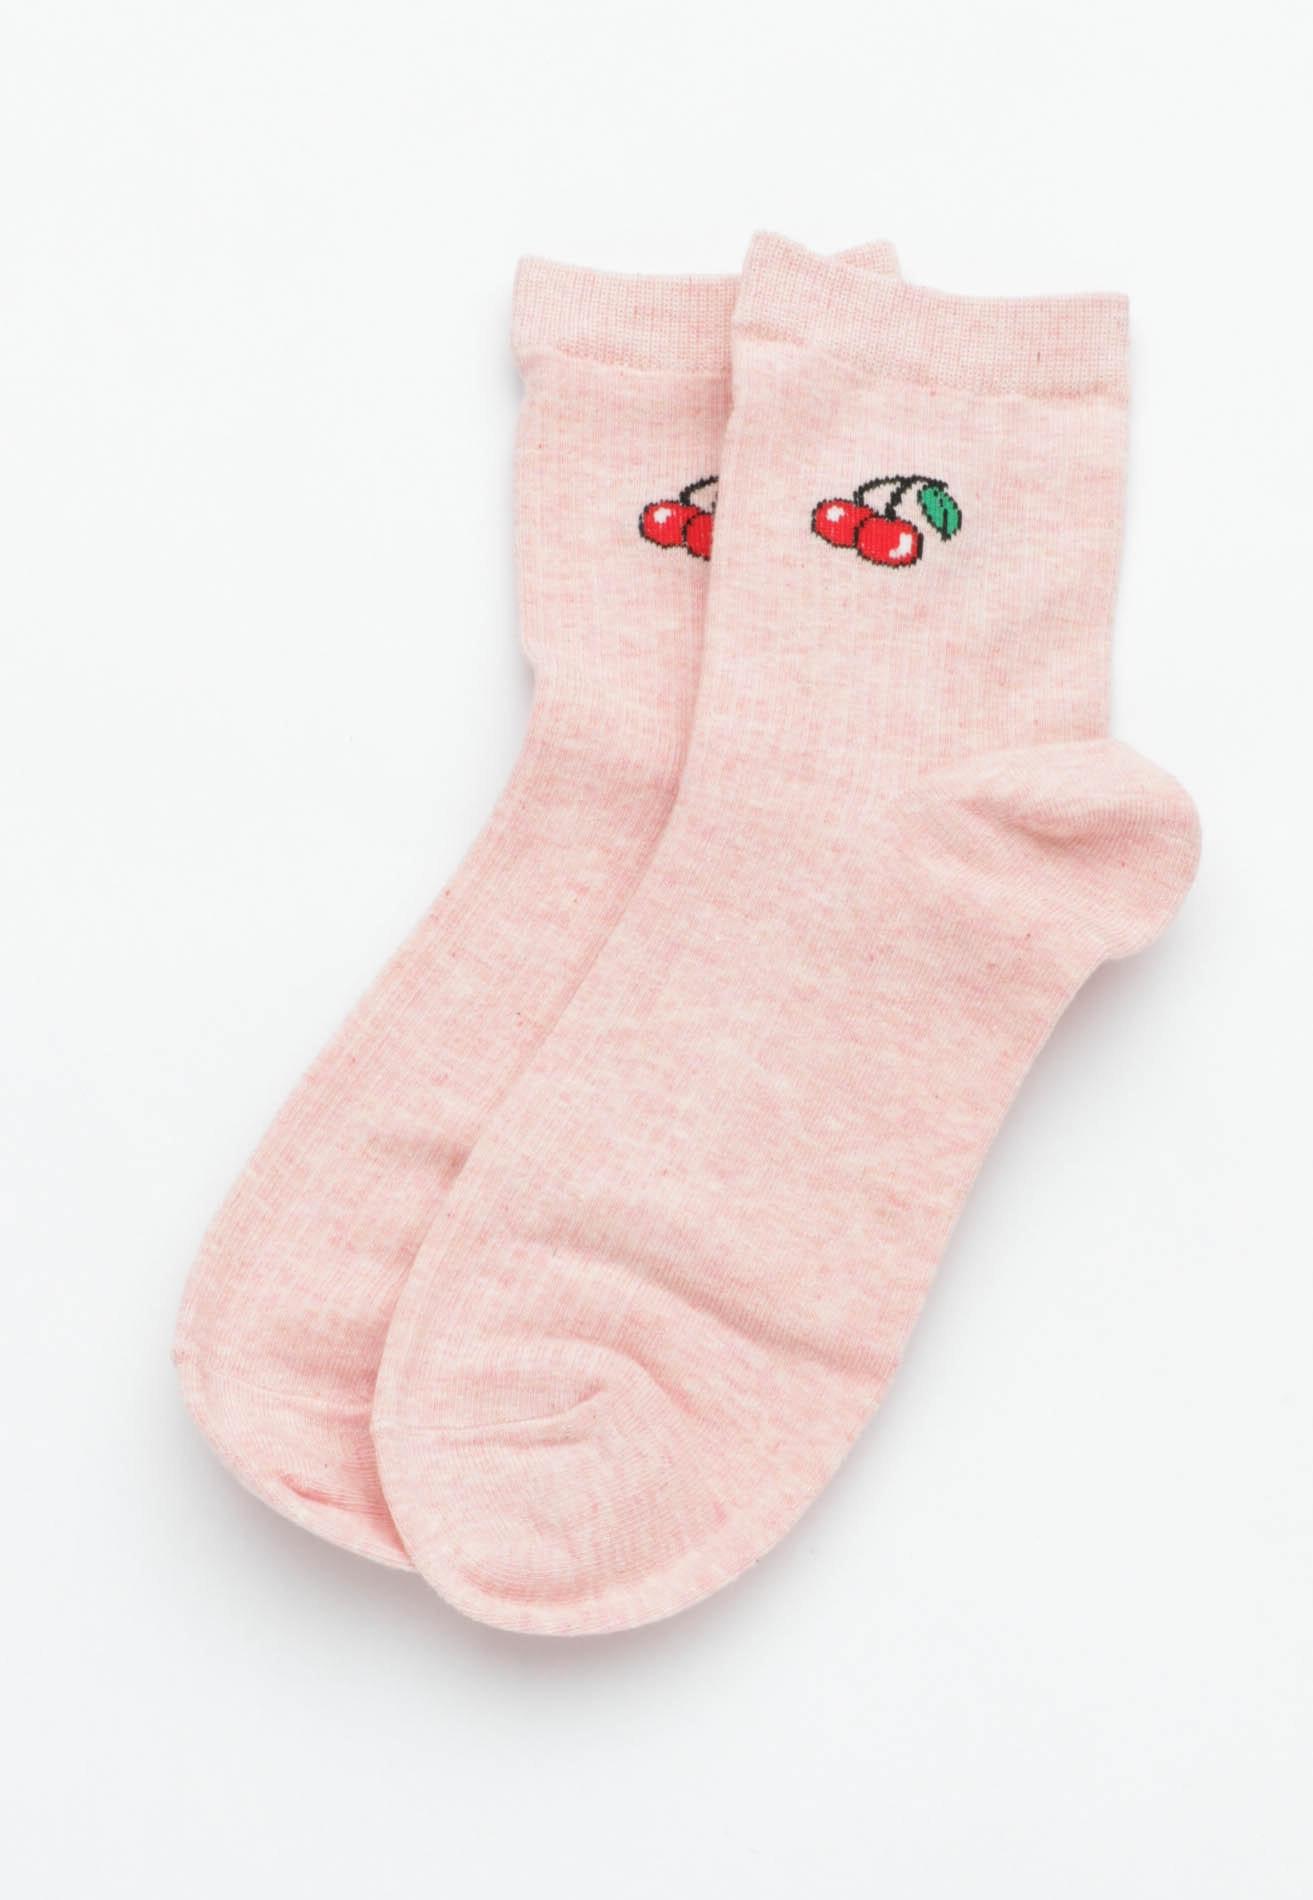 Cherry Socks - Blush